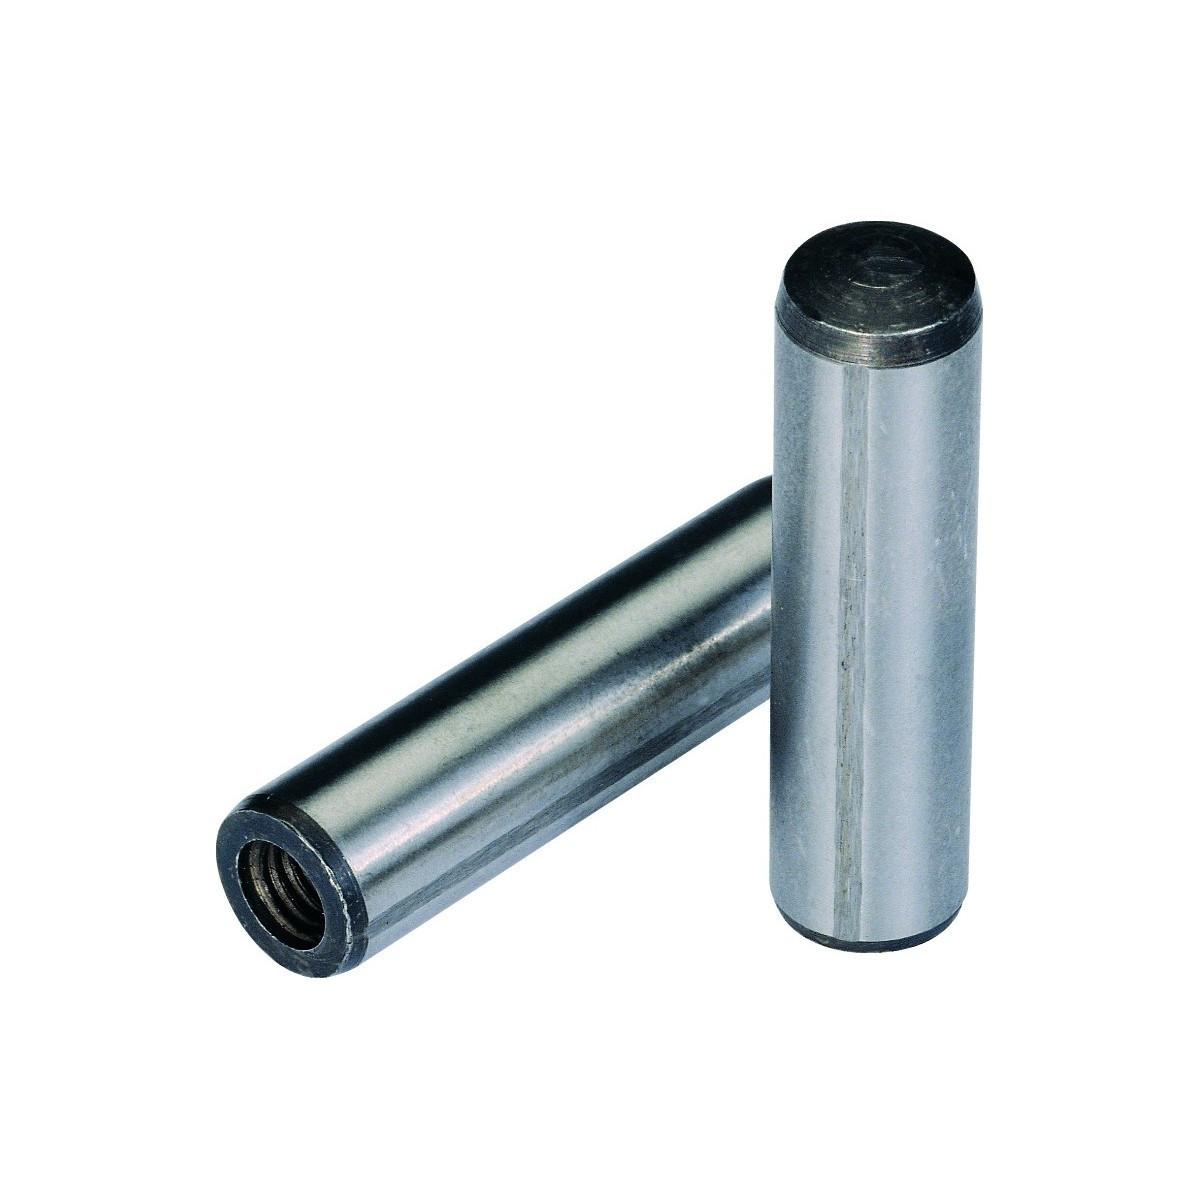 Штифт цилиндрический MMG  DIN 7979D M10 х 30 Класс 10.9 (Фосфат) 1 шт